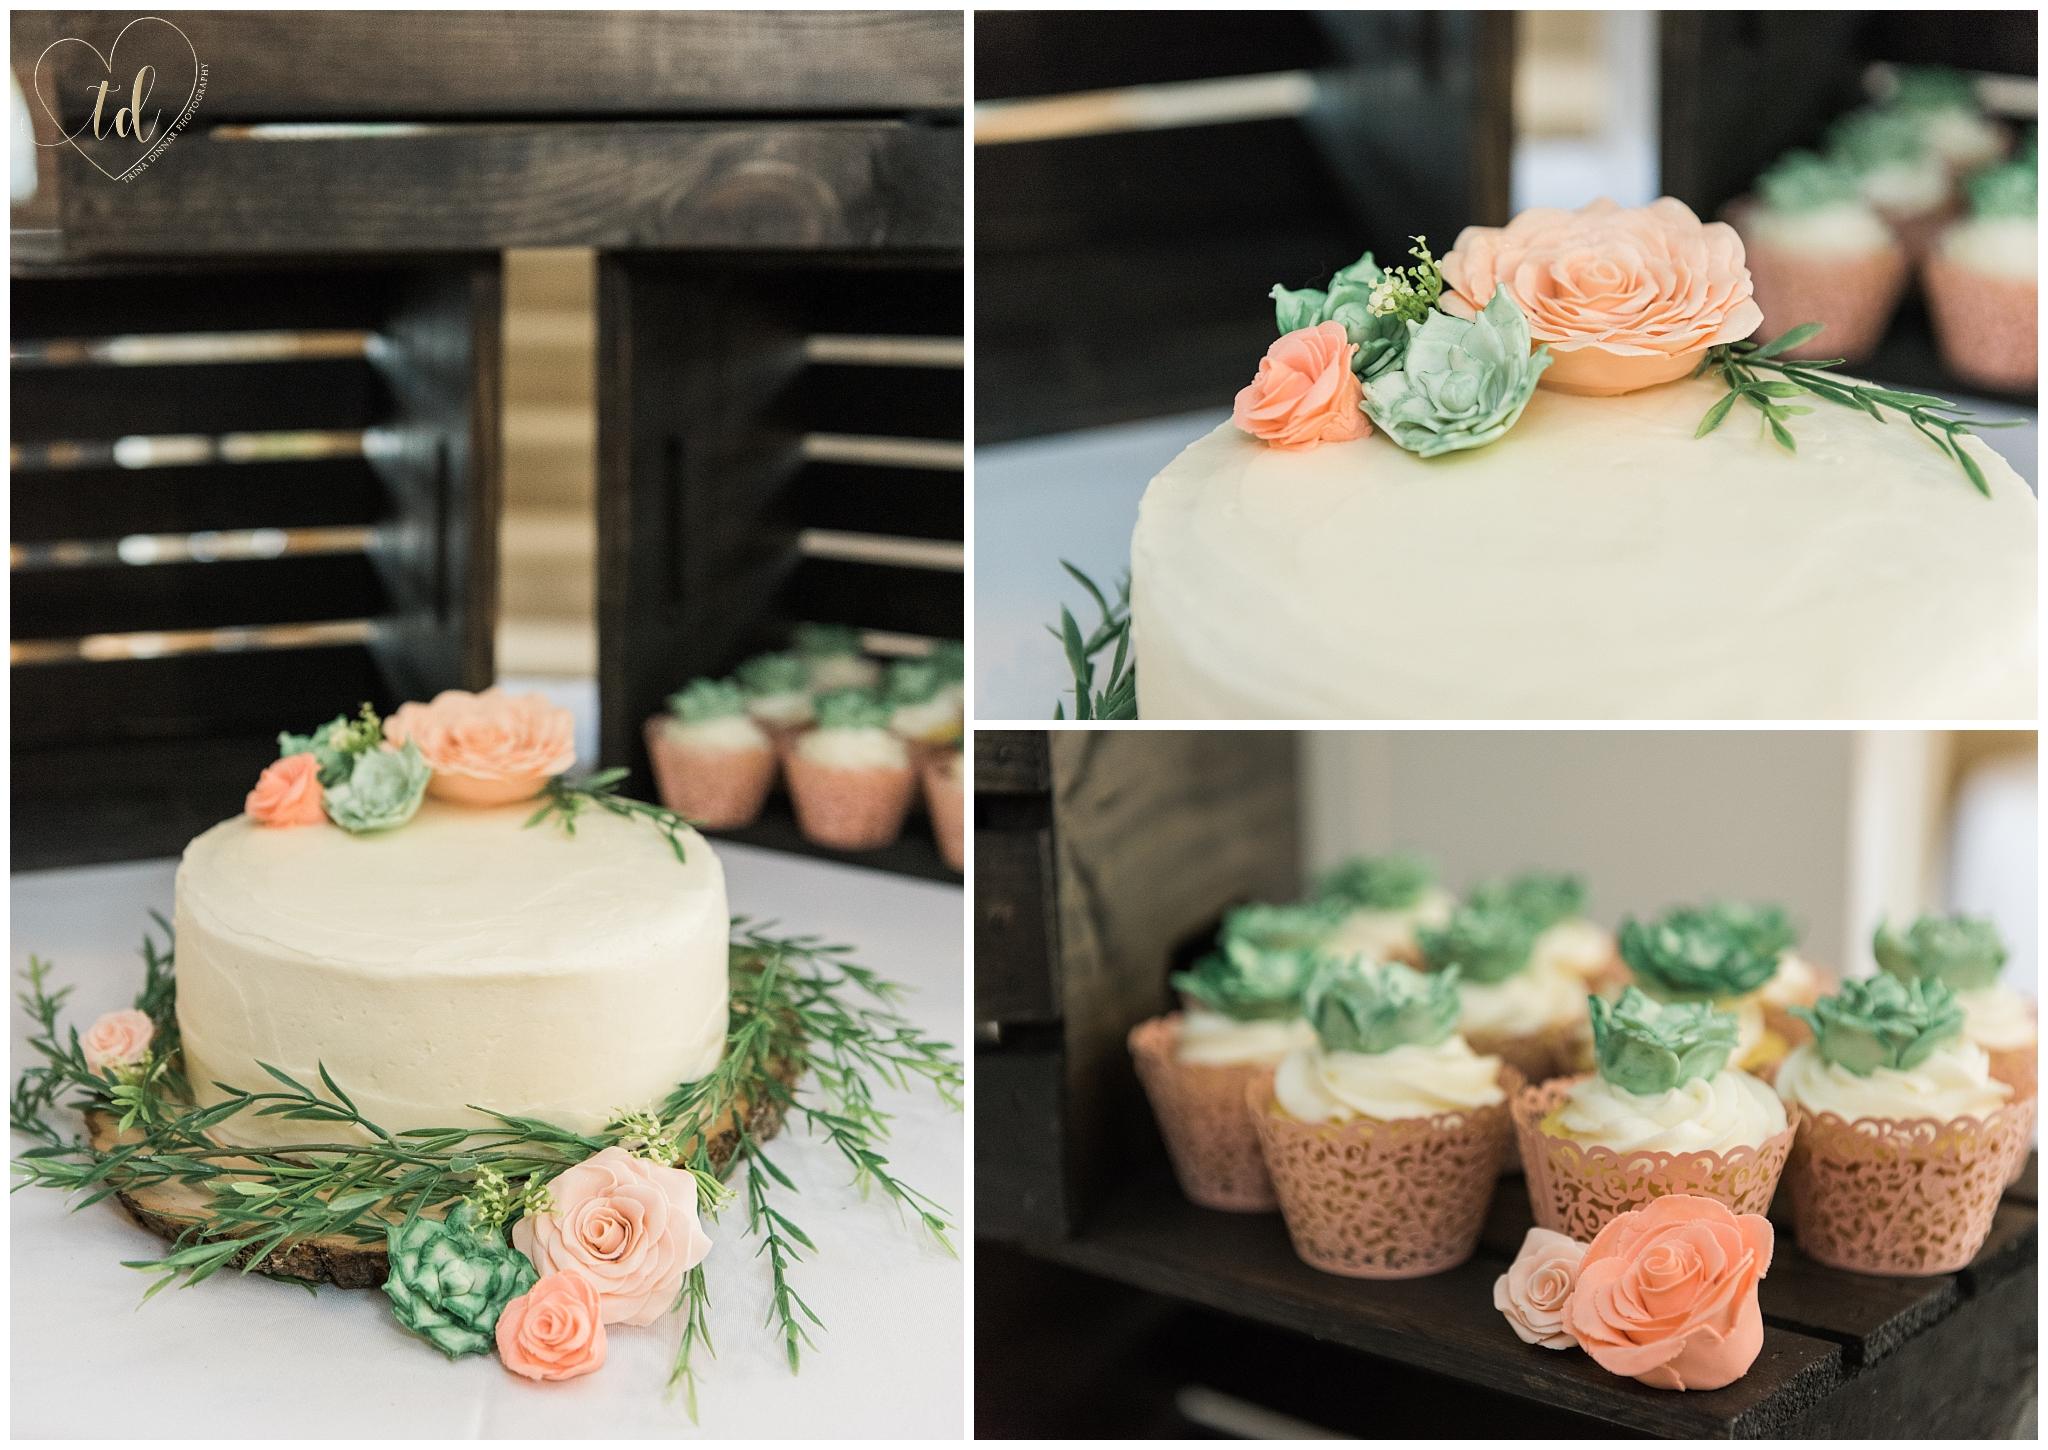 Maine Wedding Cake and cupcakes